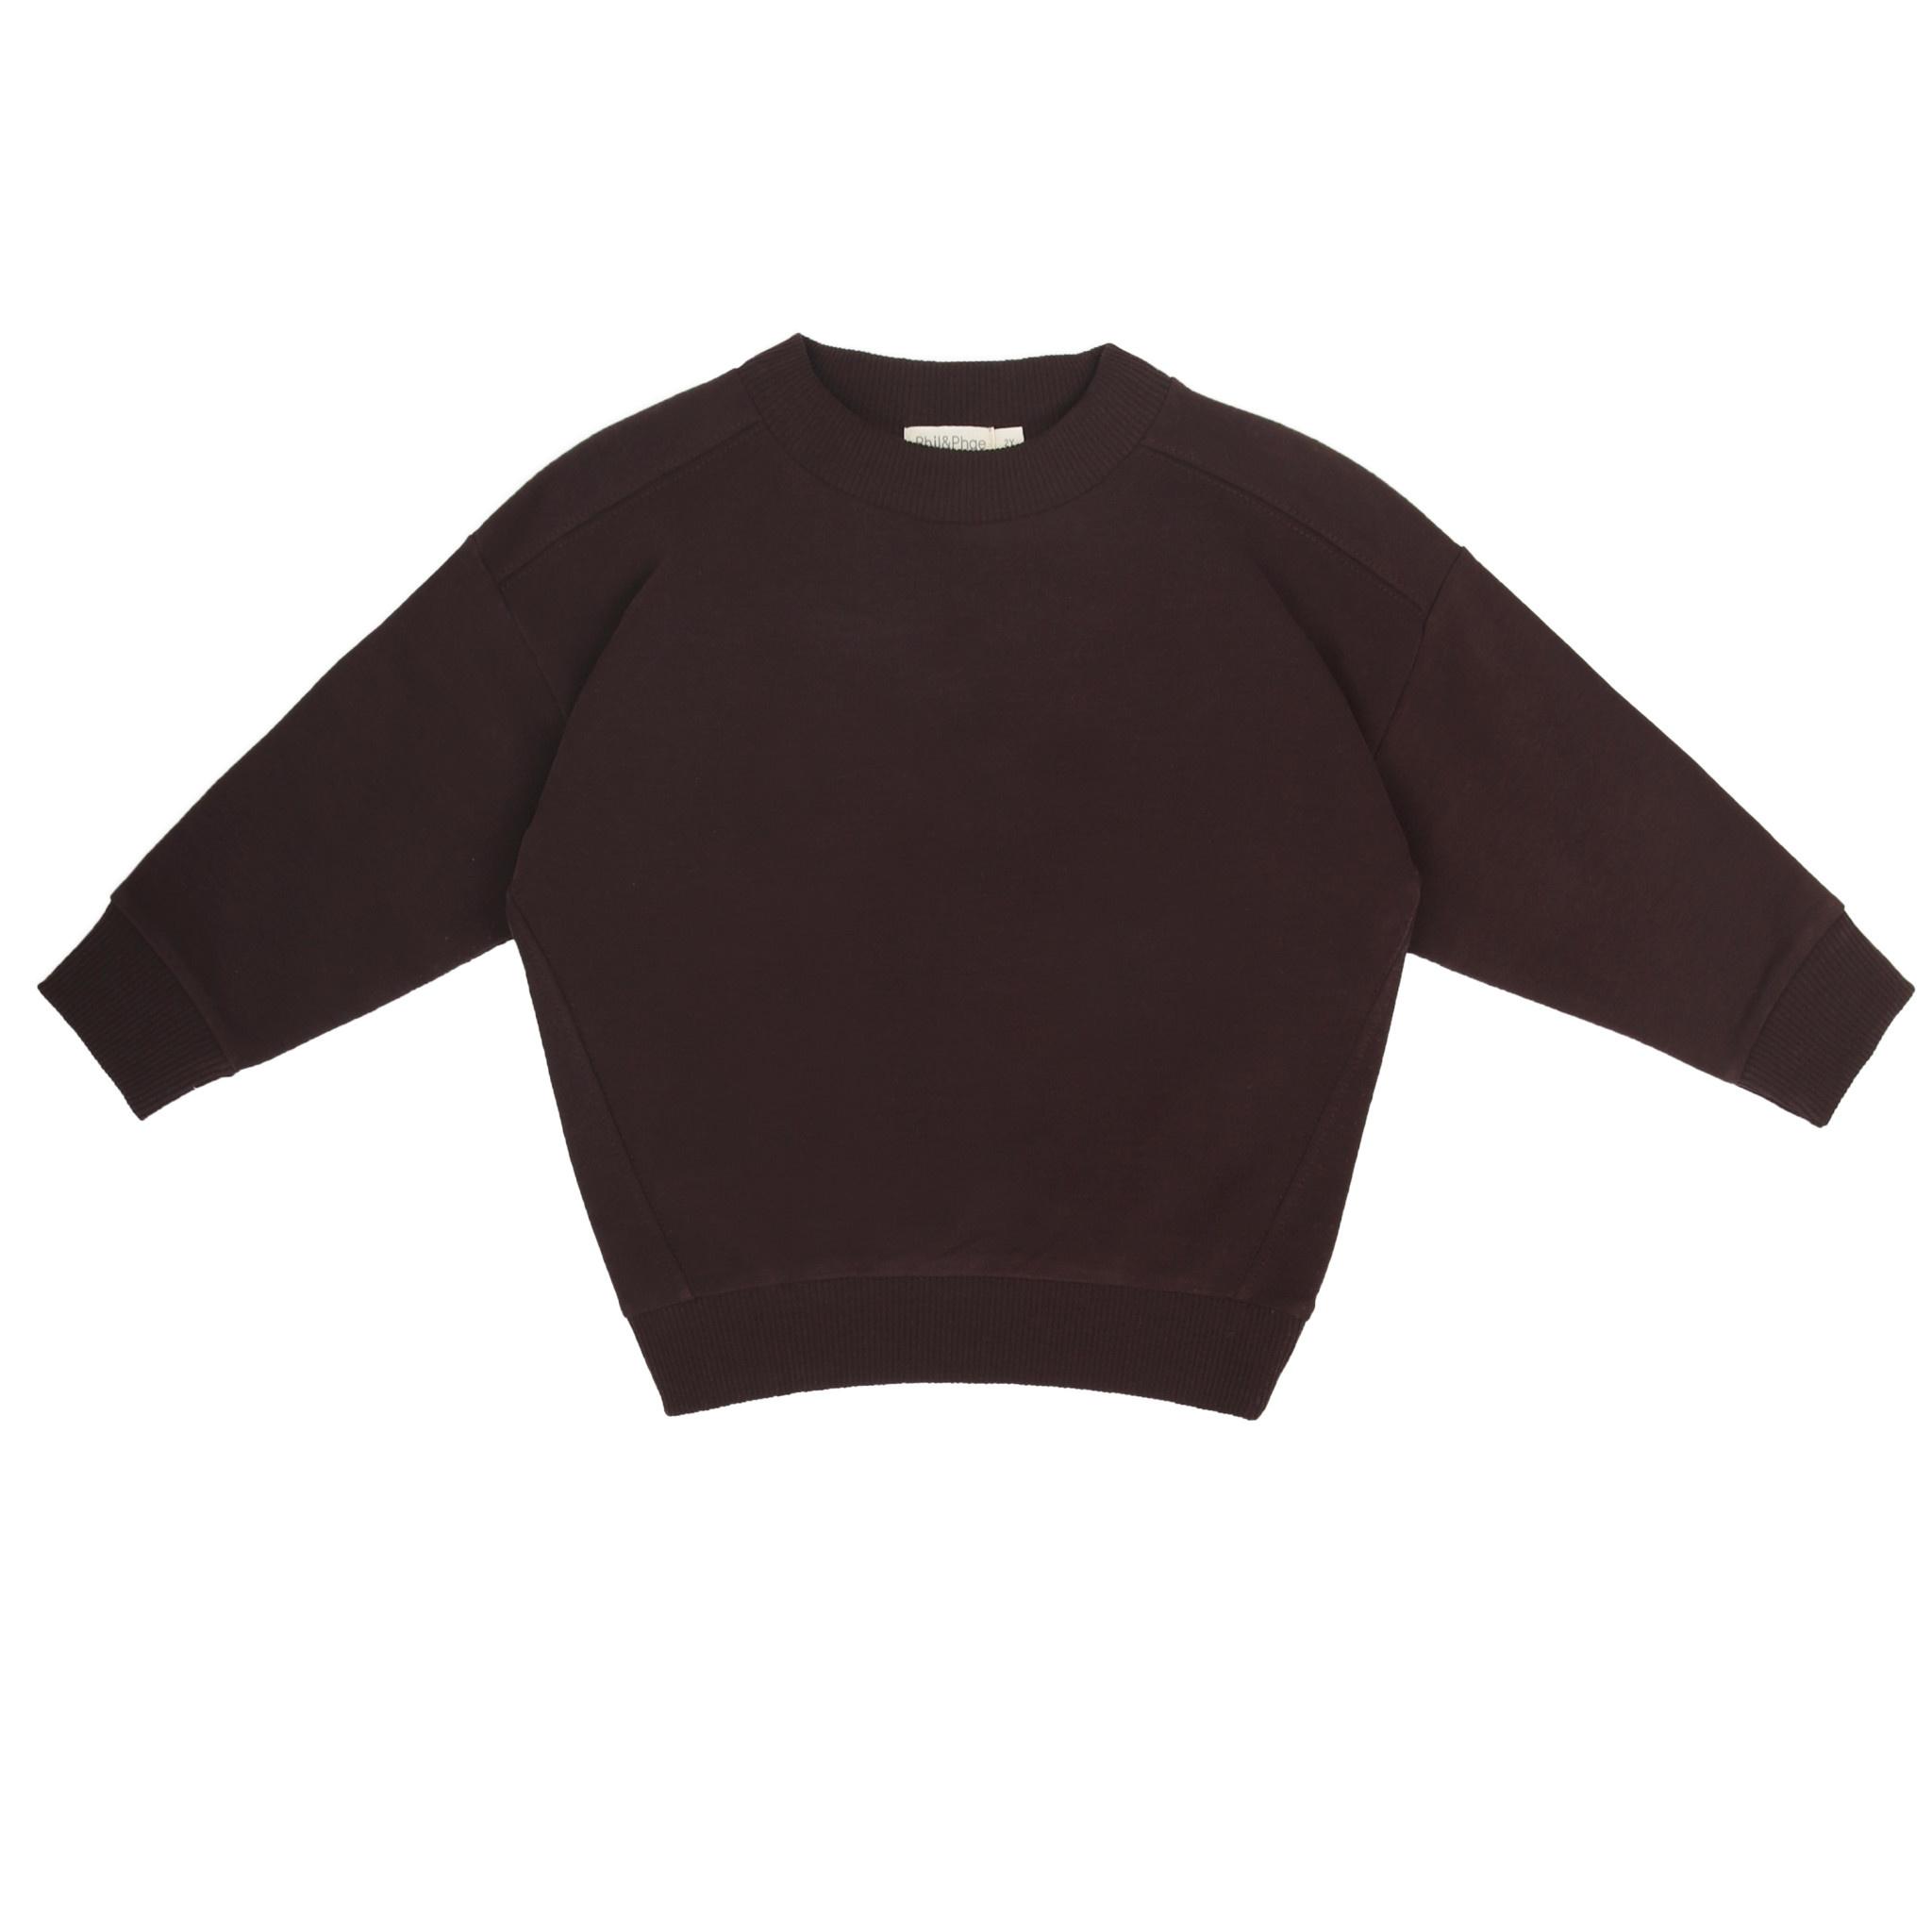 Phil&Phae Phil&phae - Oversized sweater cacao nib